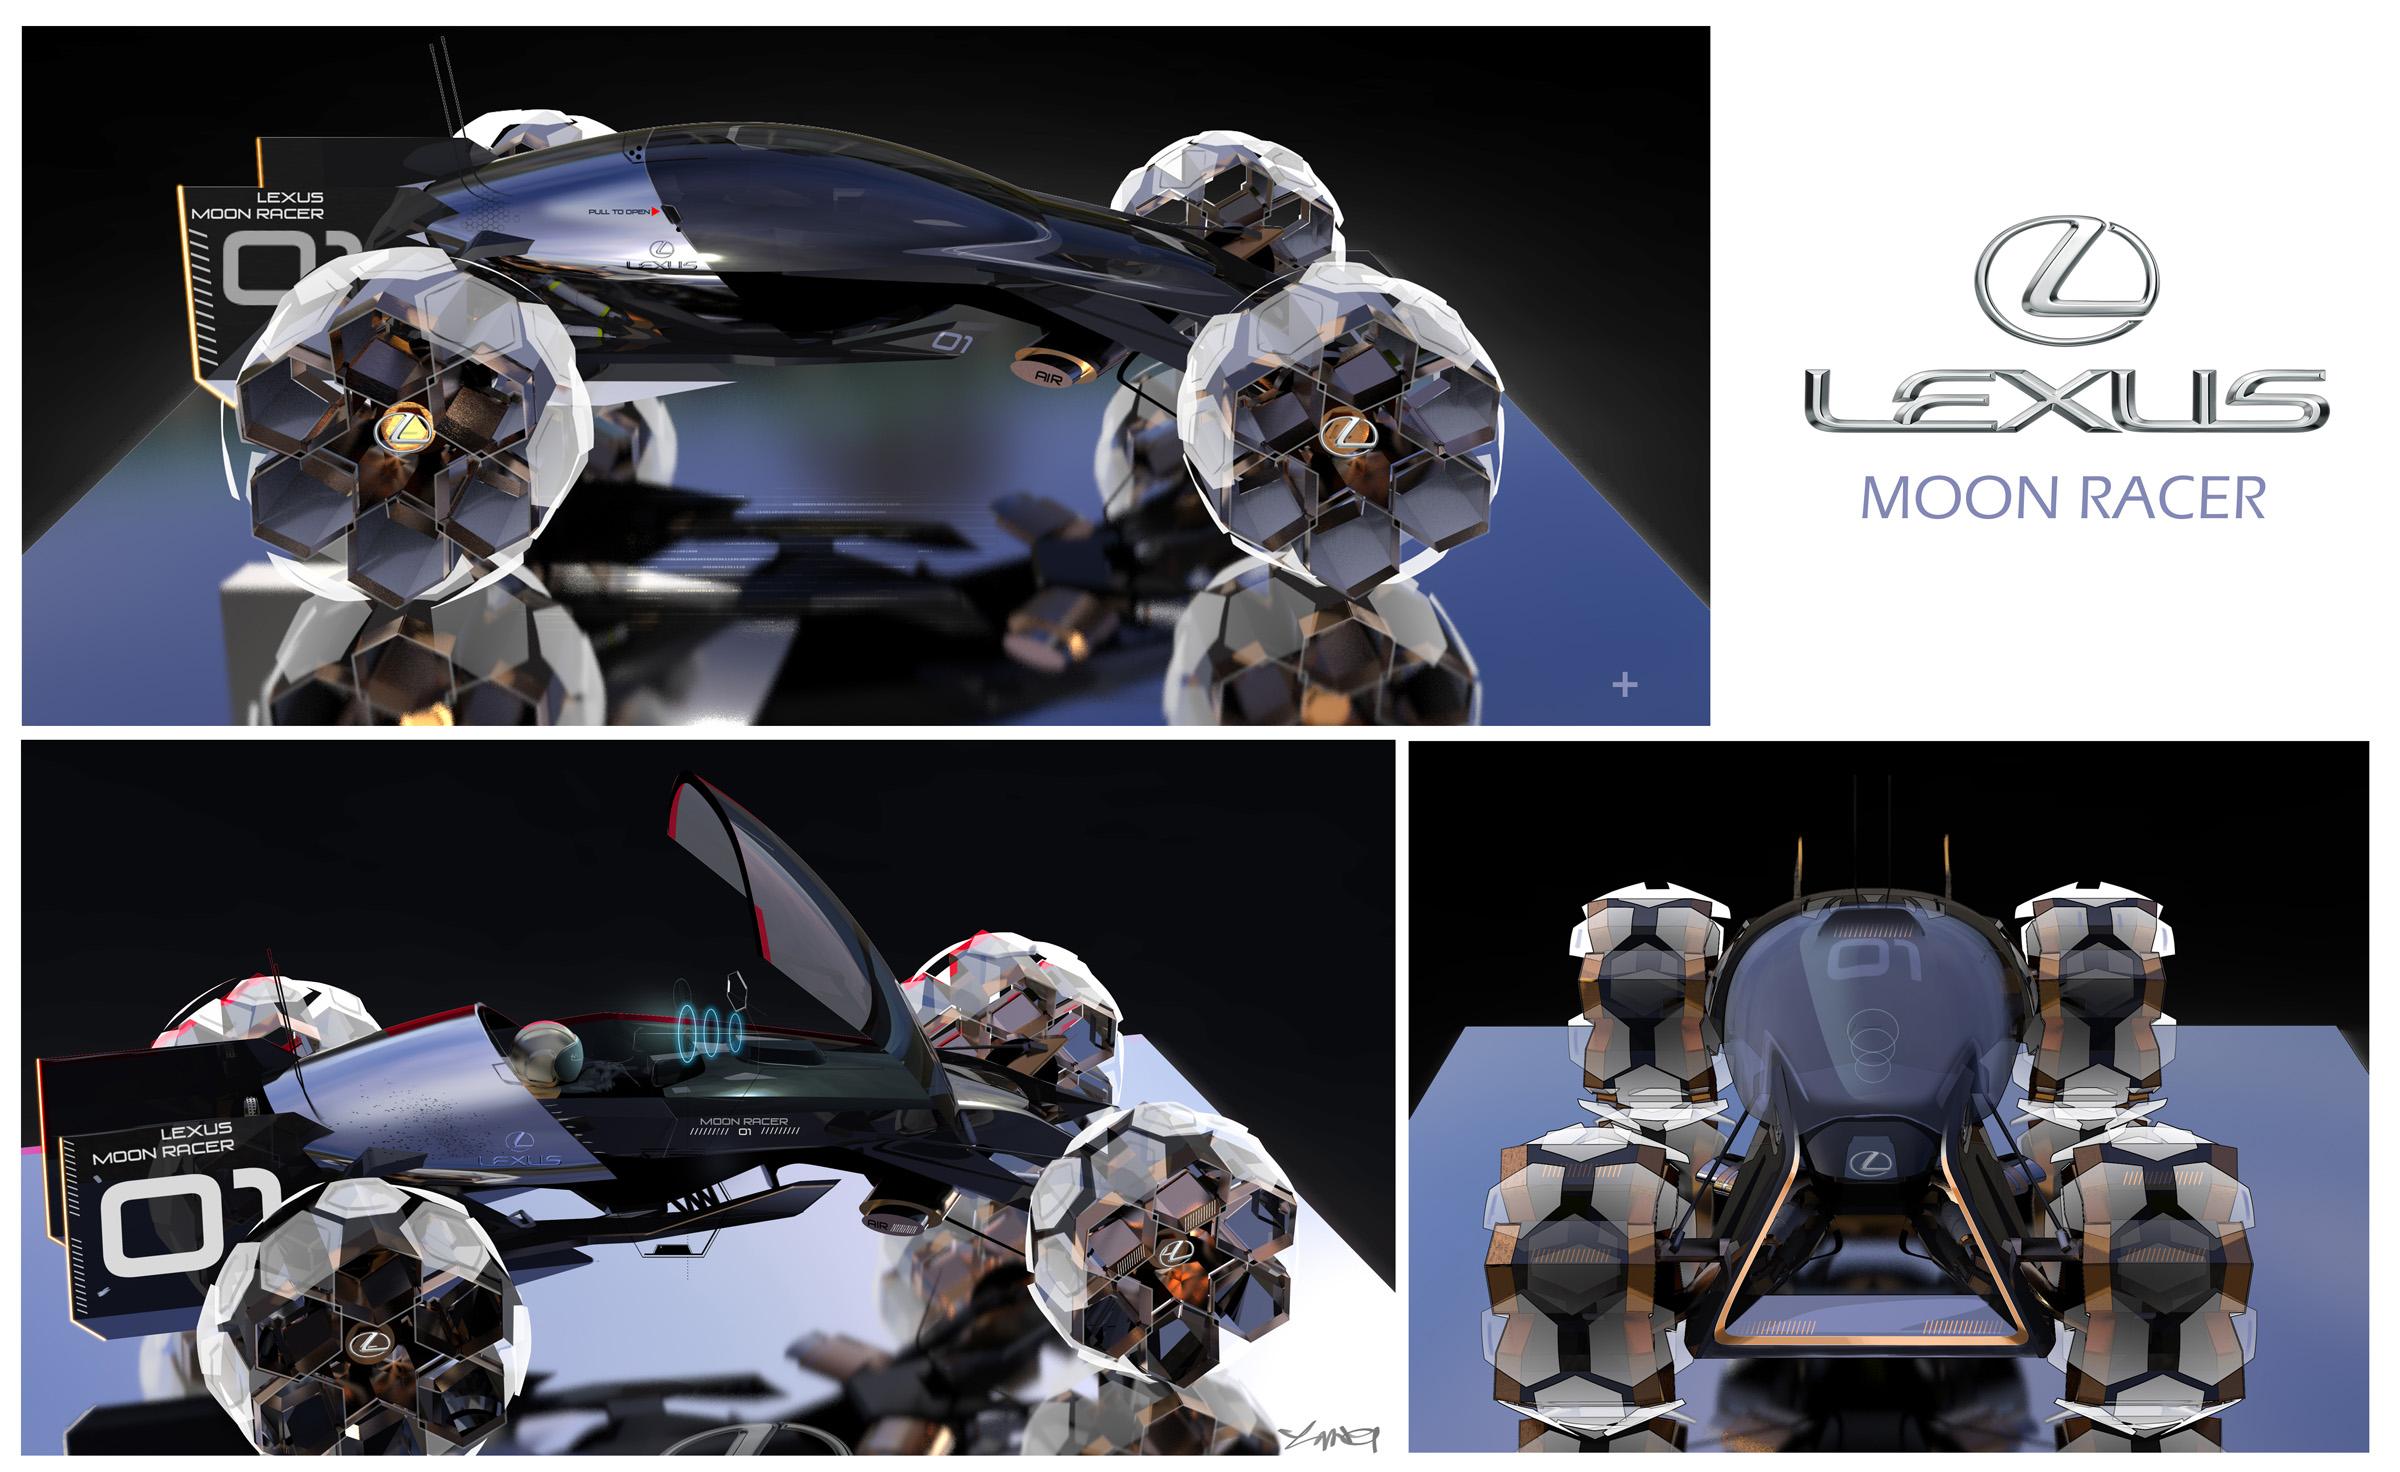 Lexusmoonracer Y.presciutti